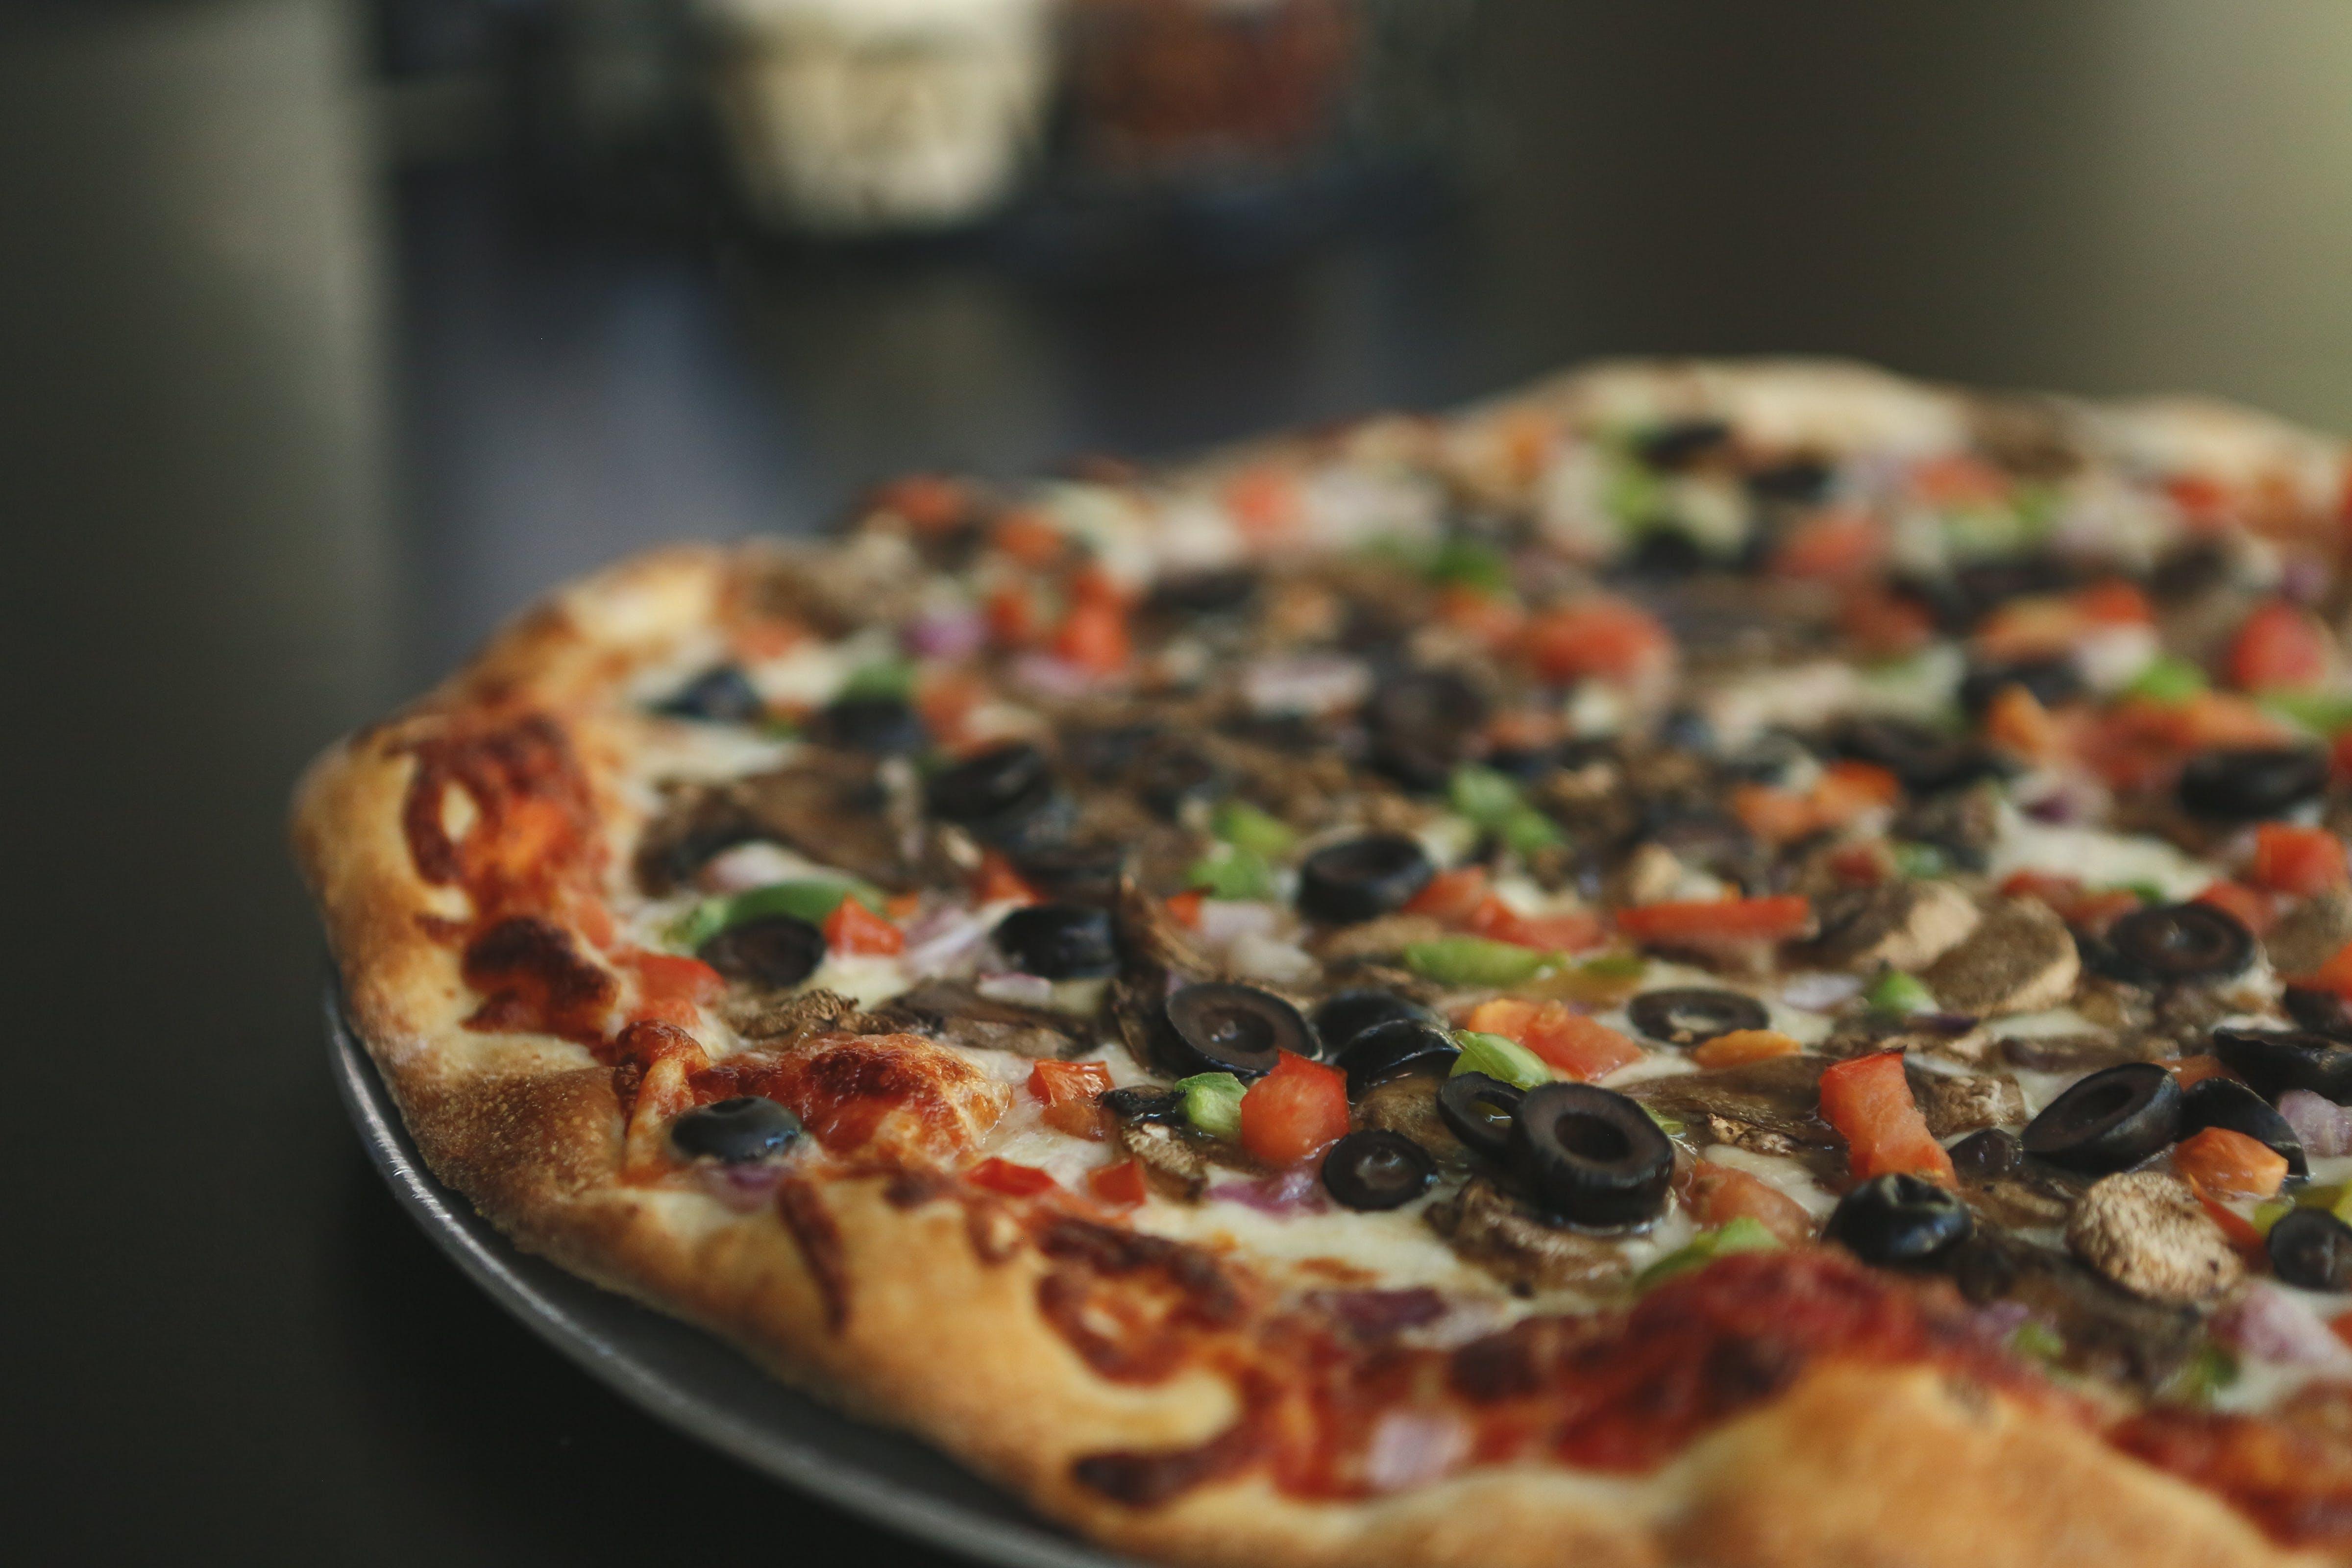 The Herbivore Pizza from Falbo Bros. Pizzeria - Sun Prairie in Sun Prairie, WI